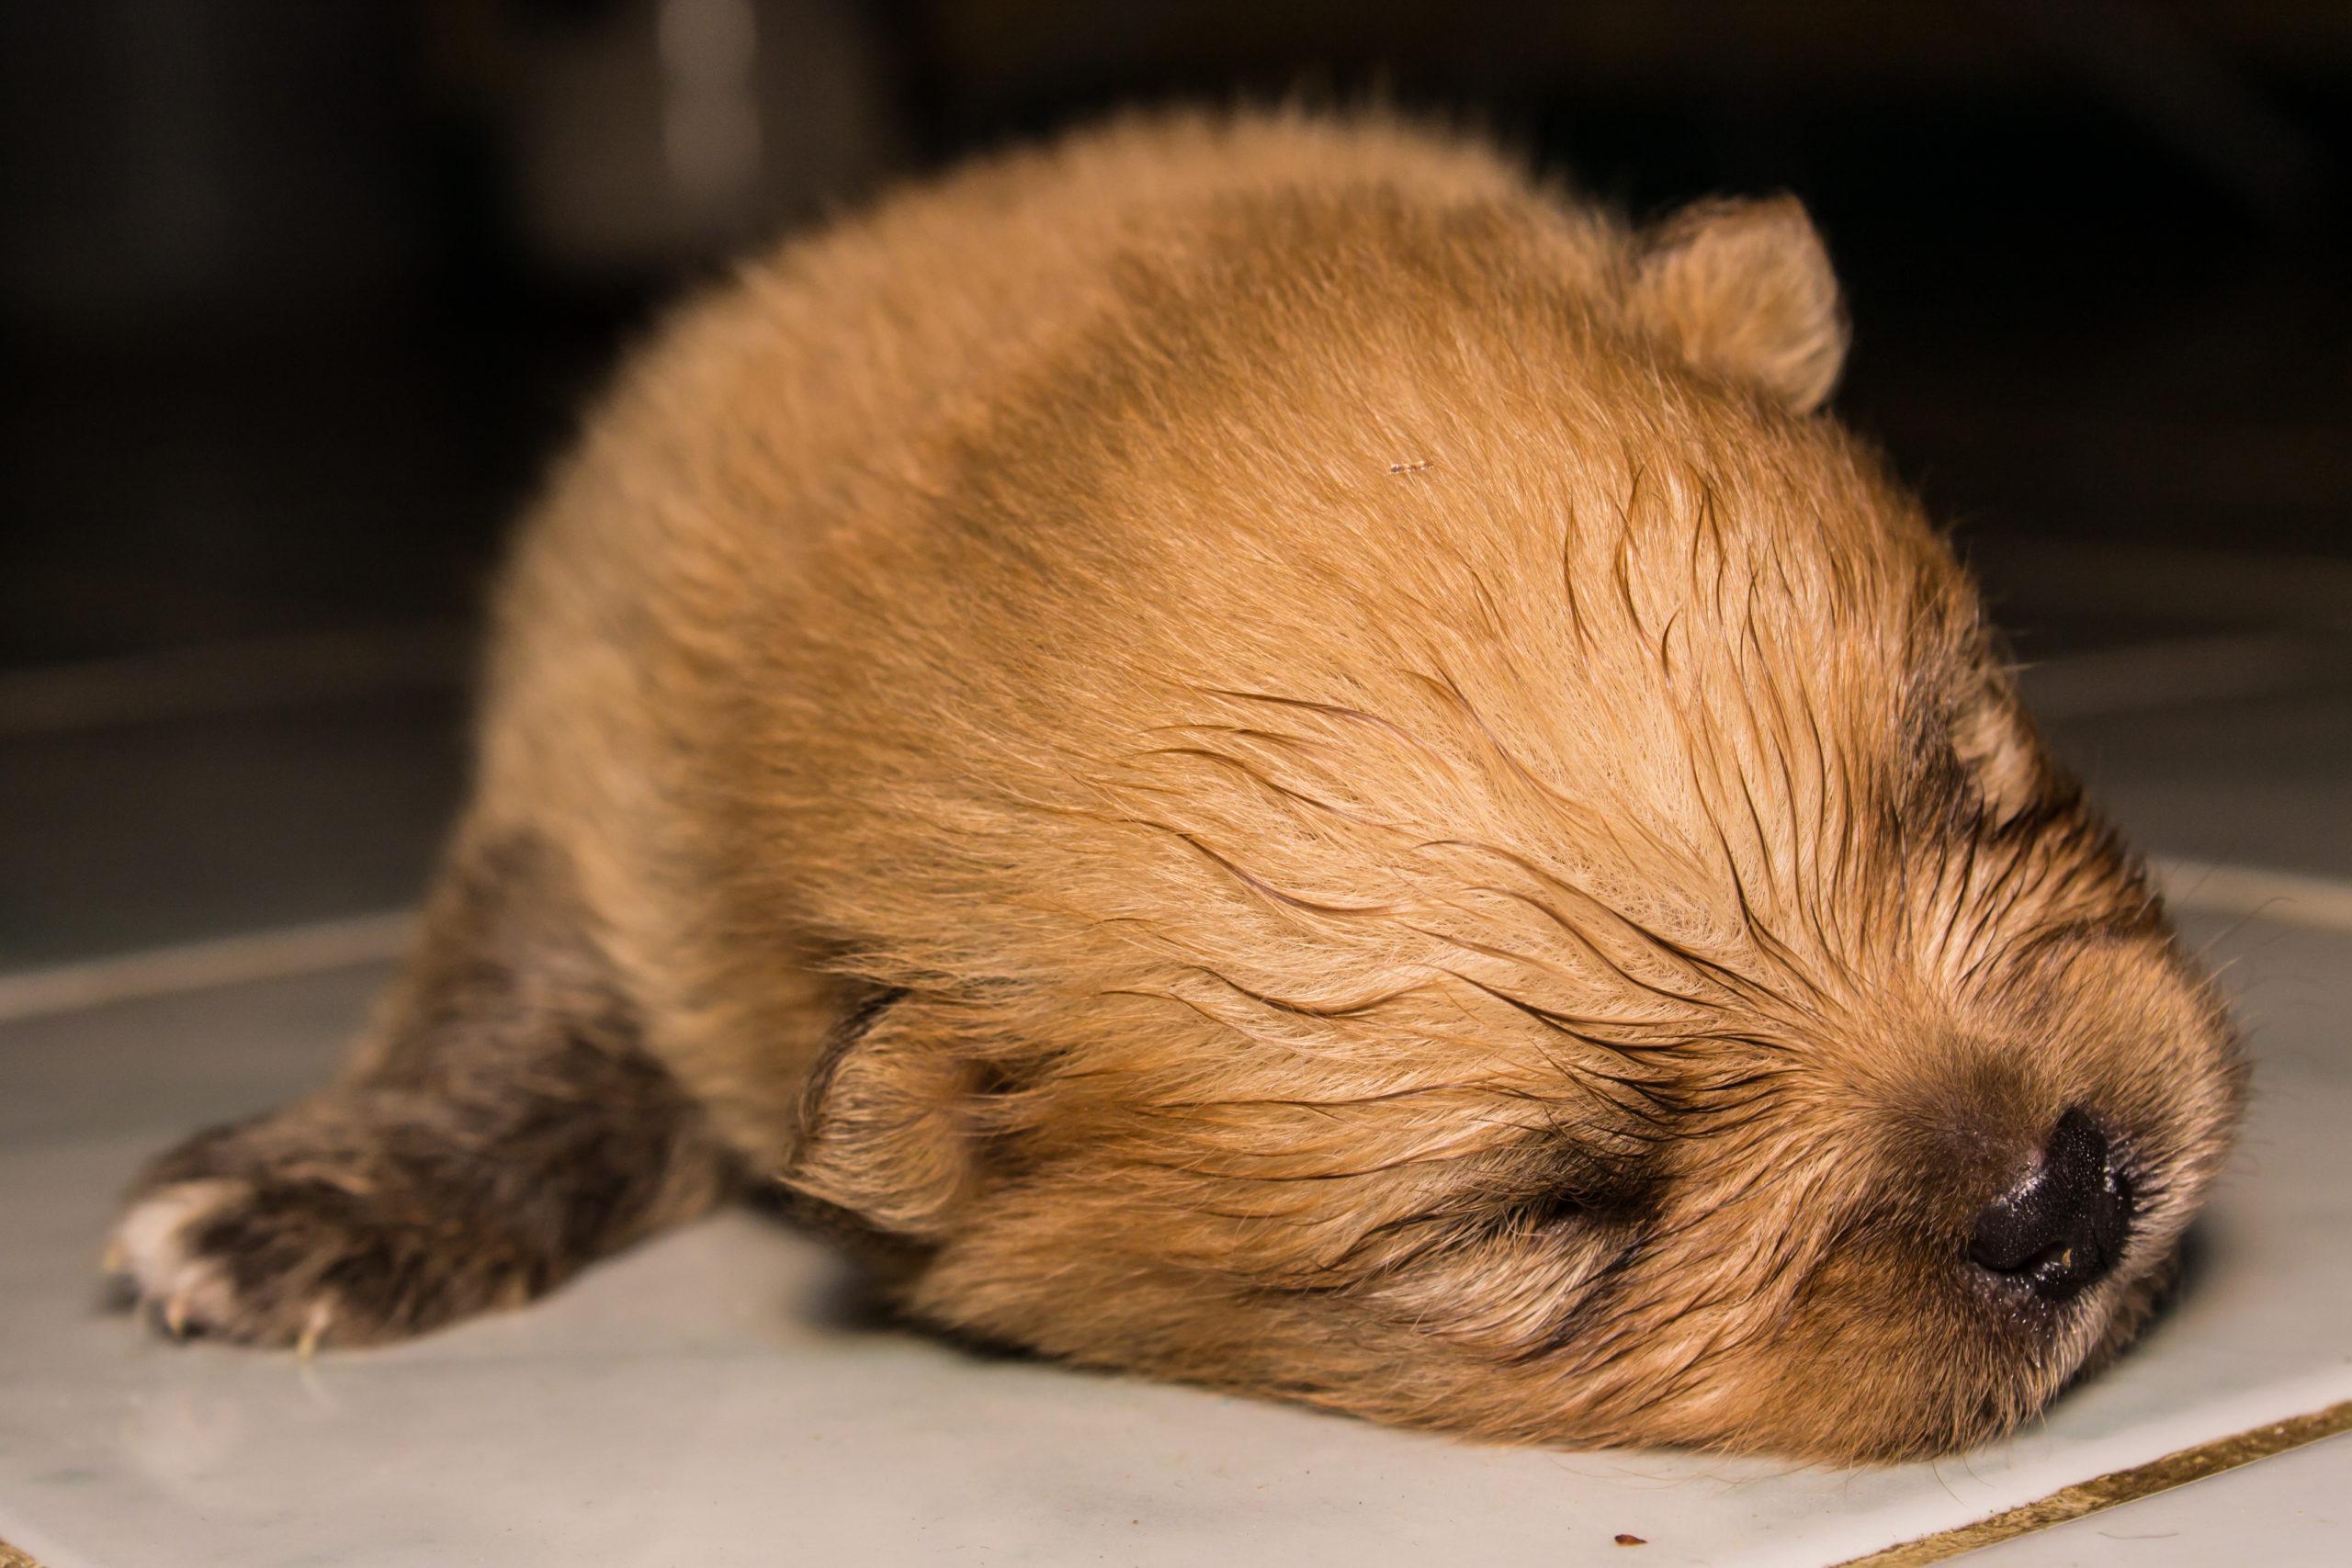 Fluffy Pomeranian puppy, sleeping.